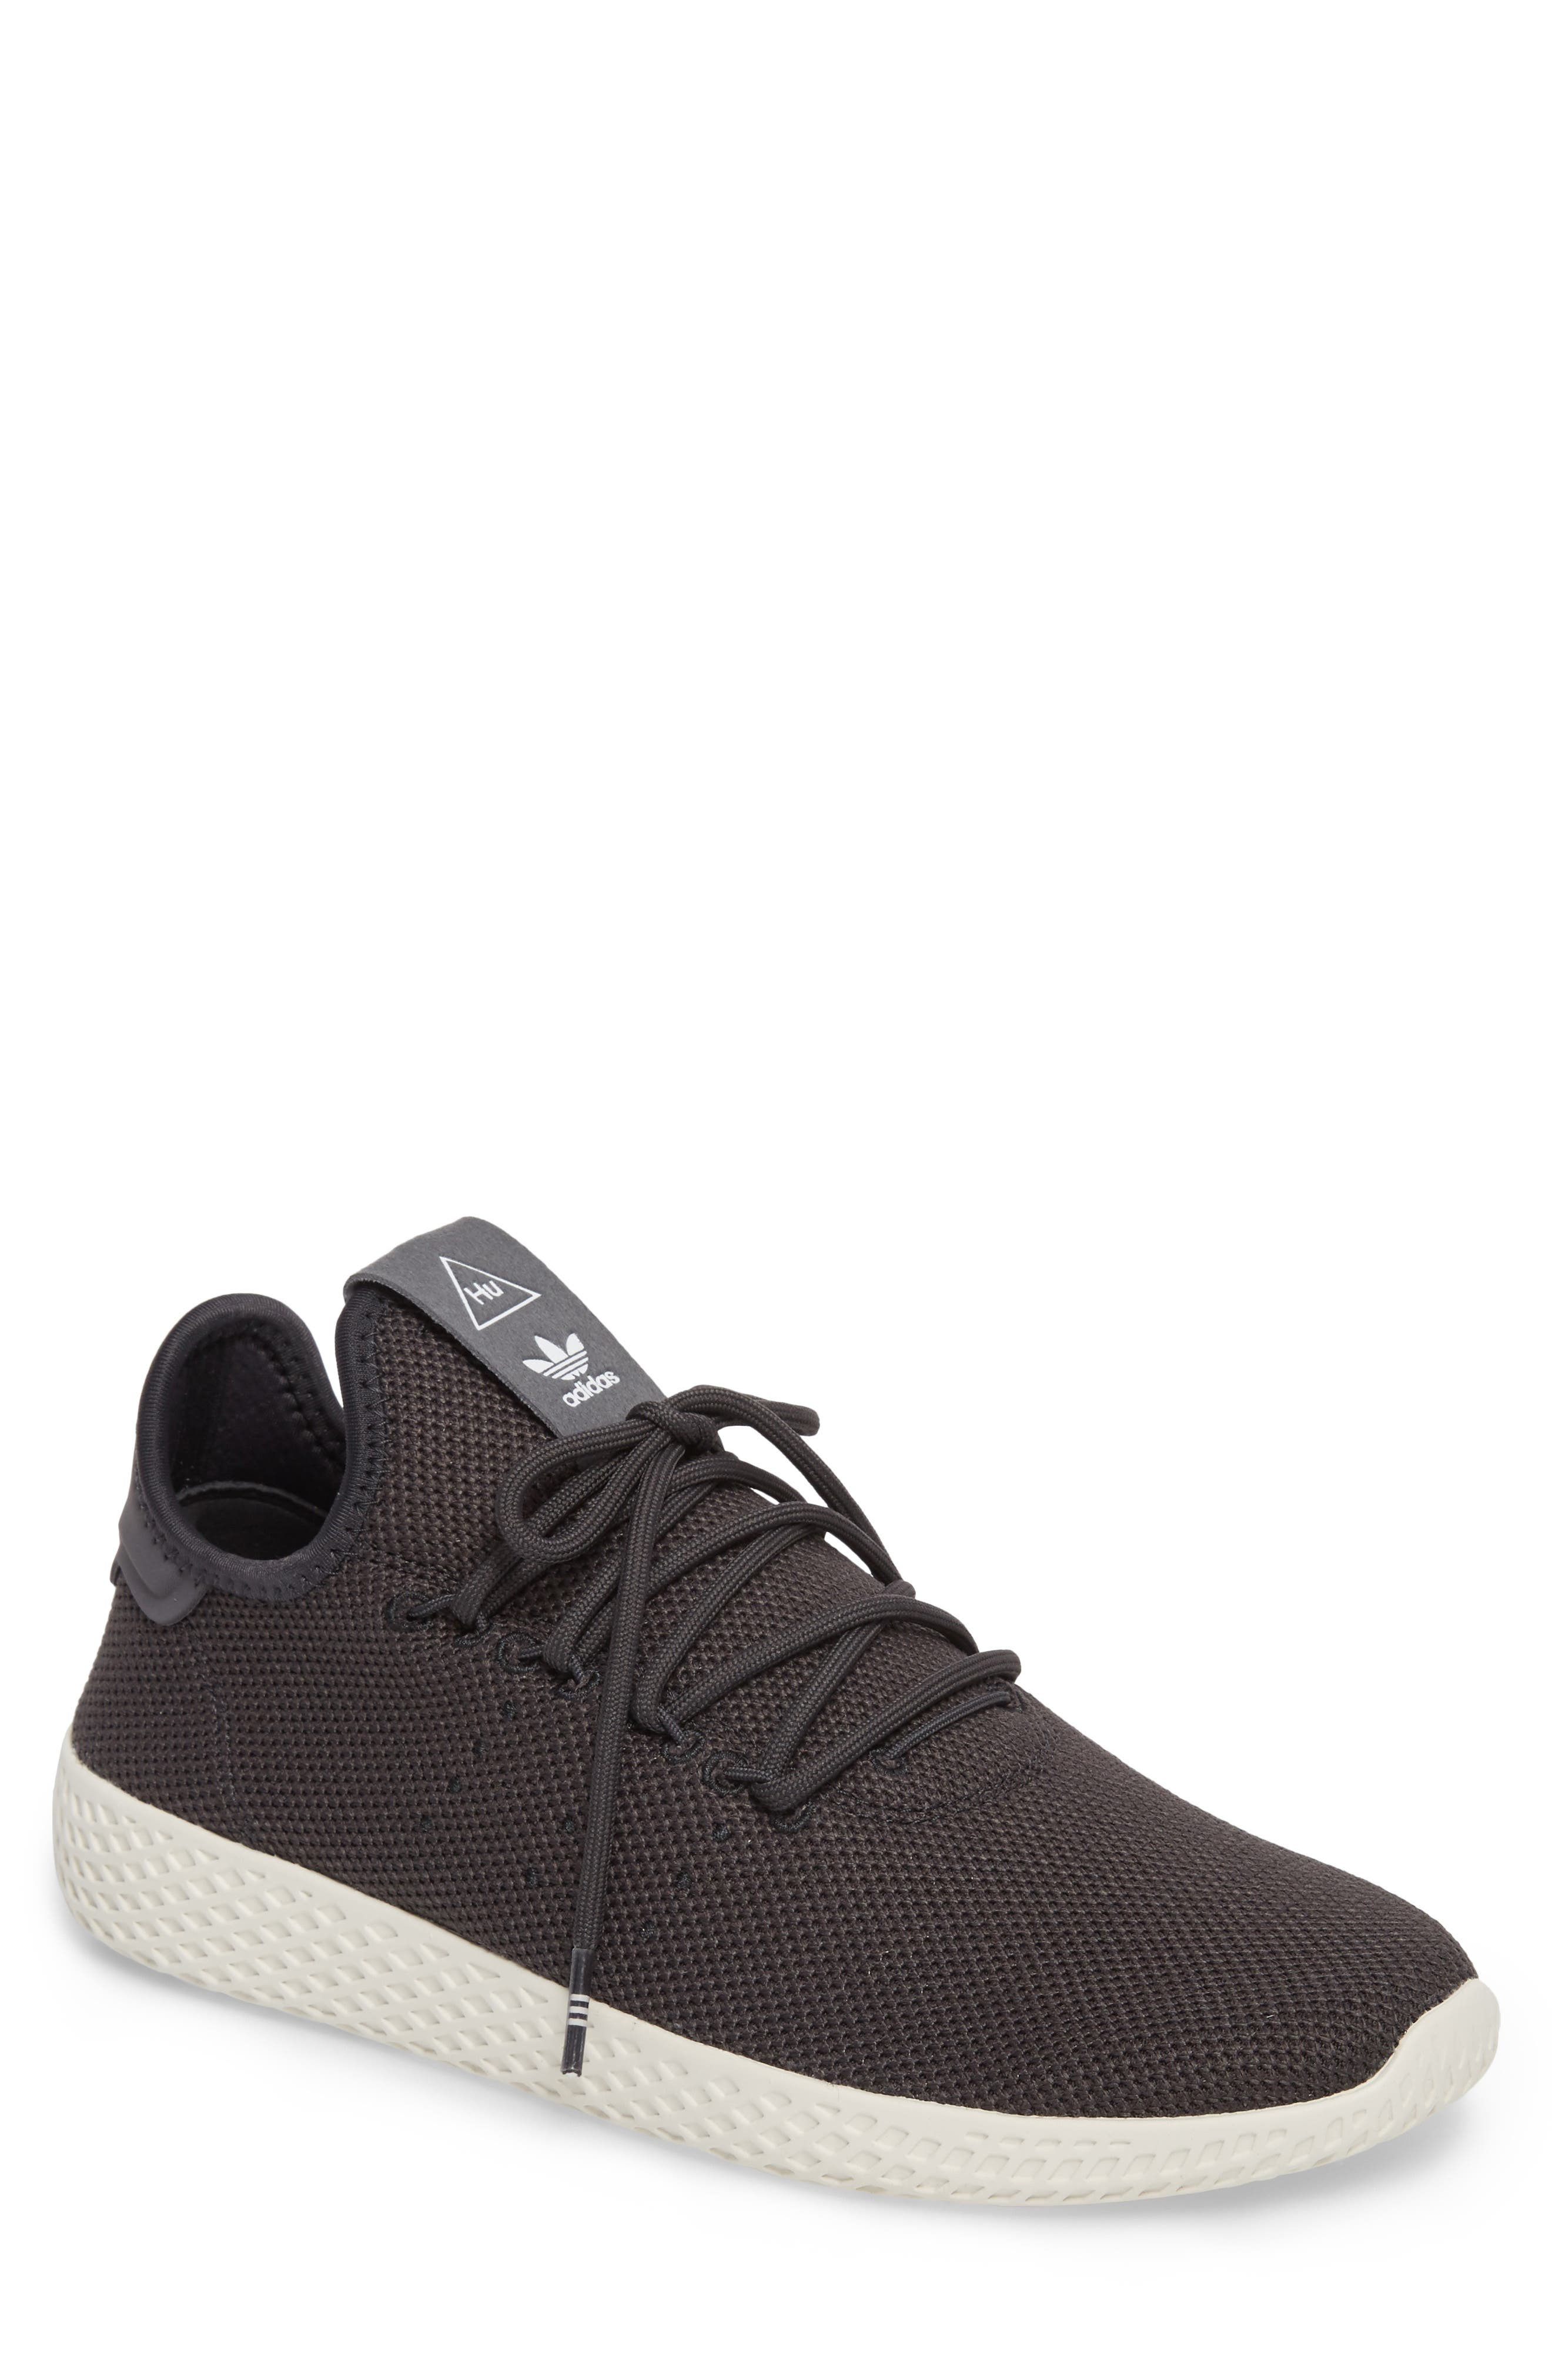 Pharrell Williams Tennis Hu Sneaker,                             Main thumbnail 1, color,                             Carbon / Carbon / Chalk White